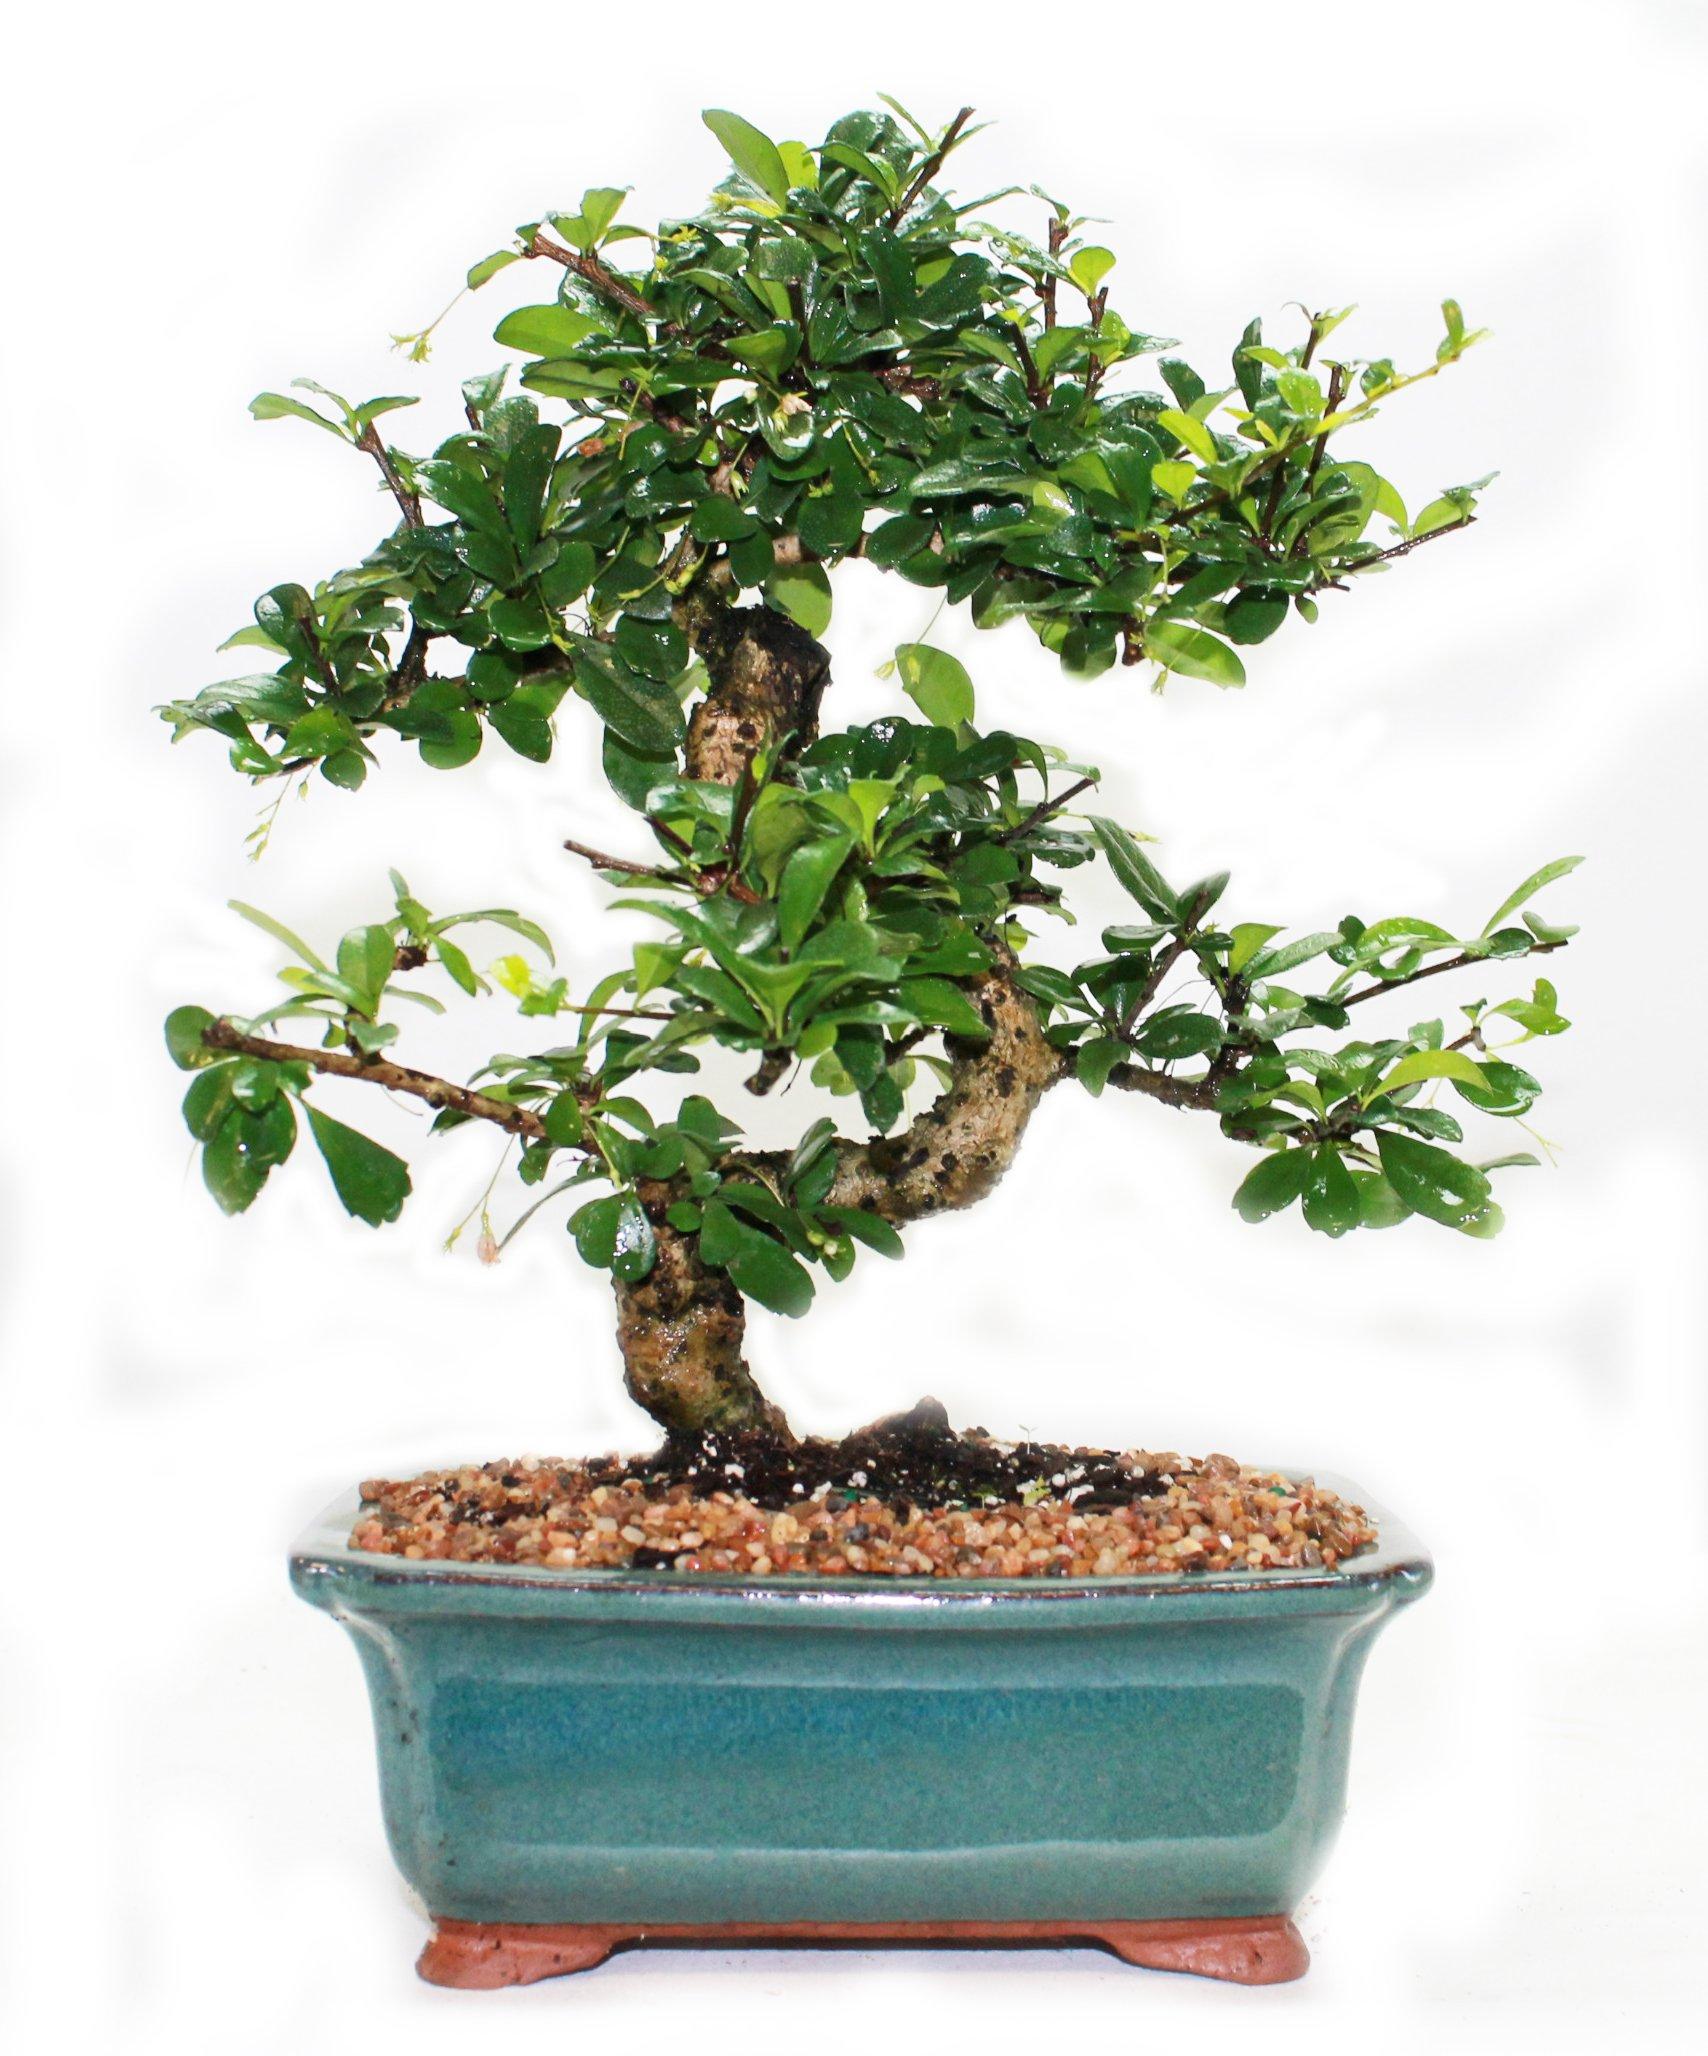 Indoorbonsaiandexotics Fukien Tea Bonsai Tree in 6inch Glazed Pot by indoorbonsaiandexotics